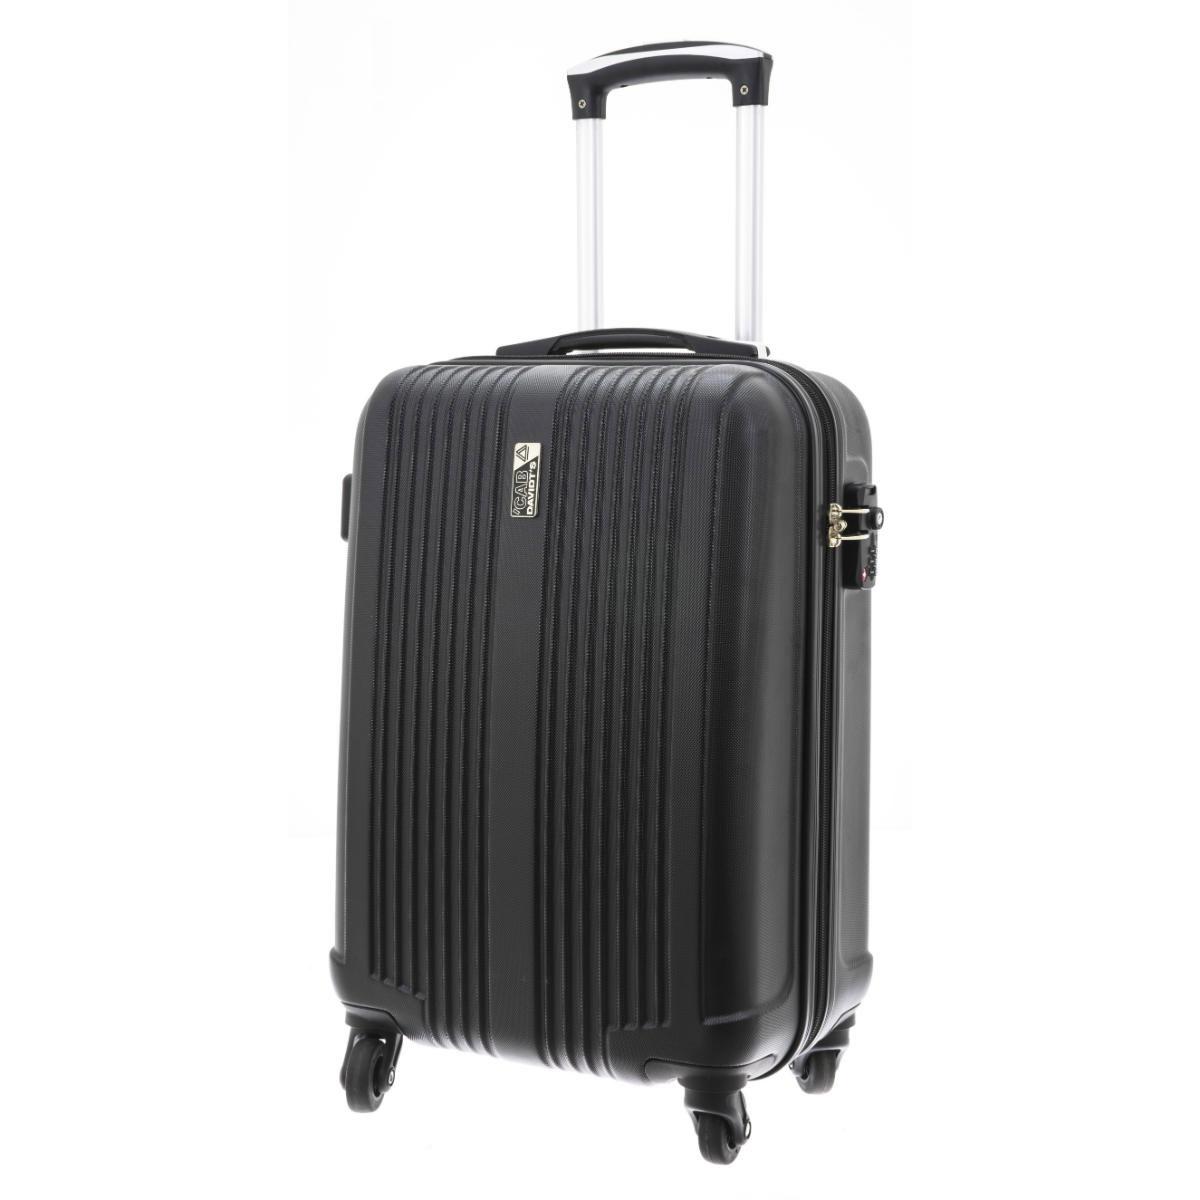 Valise trolley coque ABS \'Davidt\'s\' noir (format cabine) - 55x35x20 cm - [Q3504]